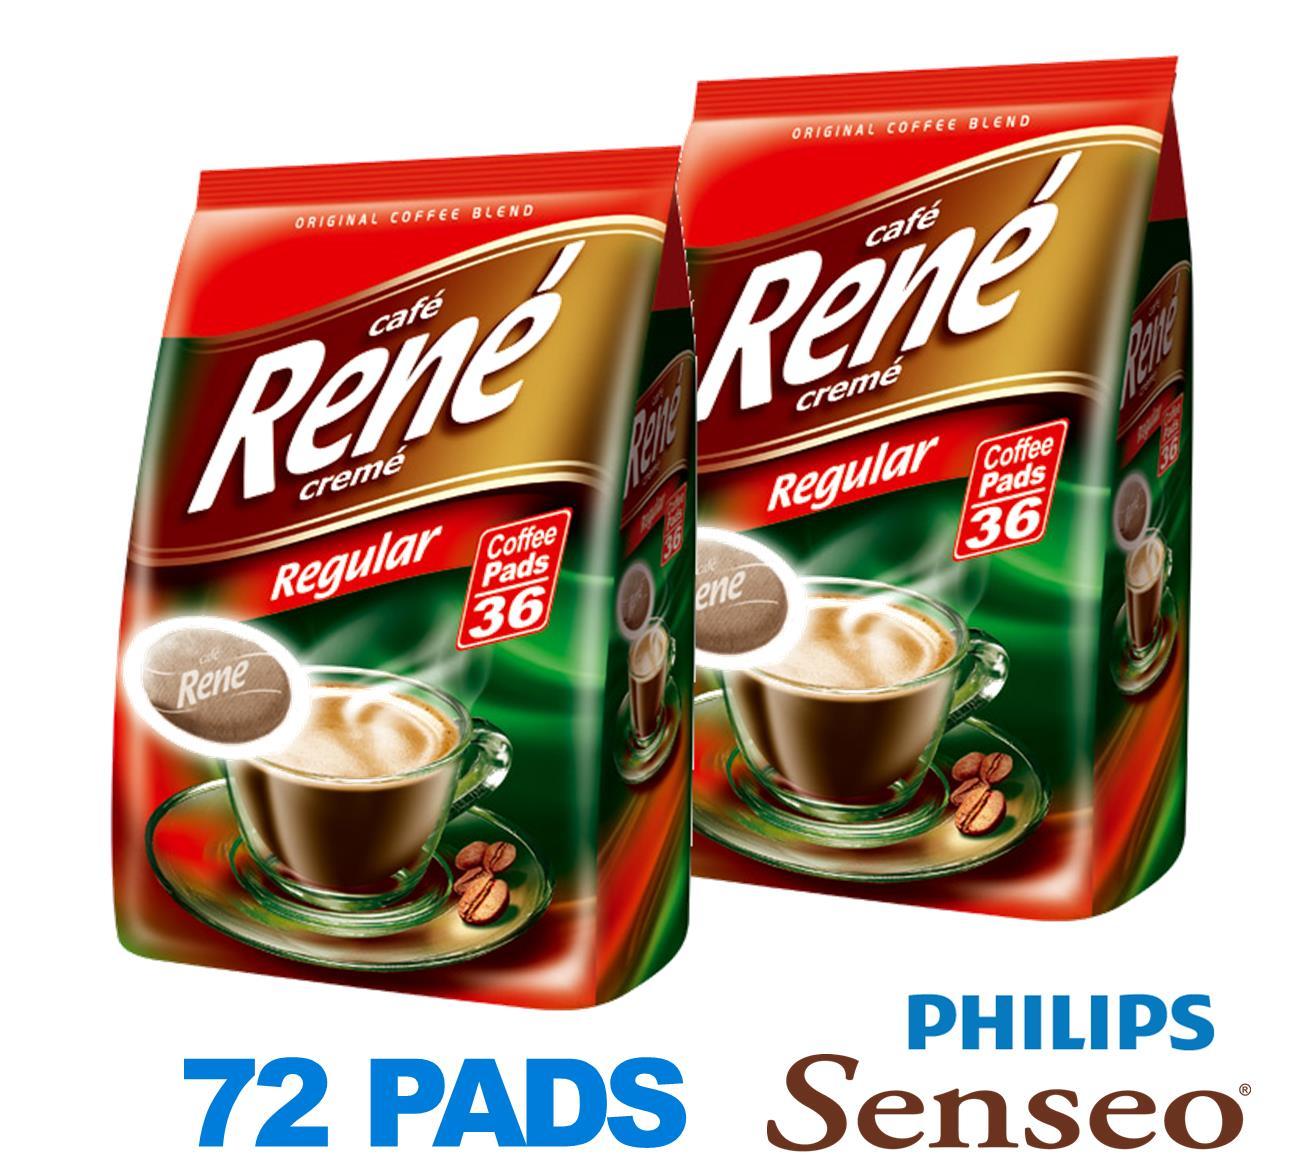 philips senseo 72 x cafe rene crem regular roast coffee. Black Bedroom Furniture Sets. Home Design Ideas